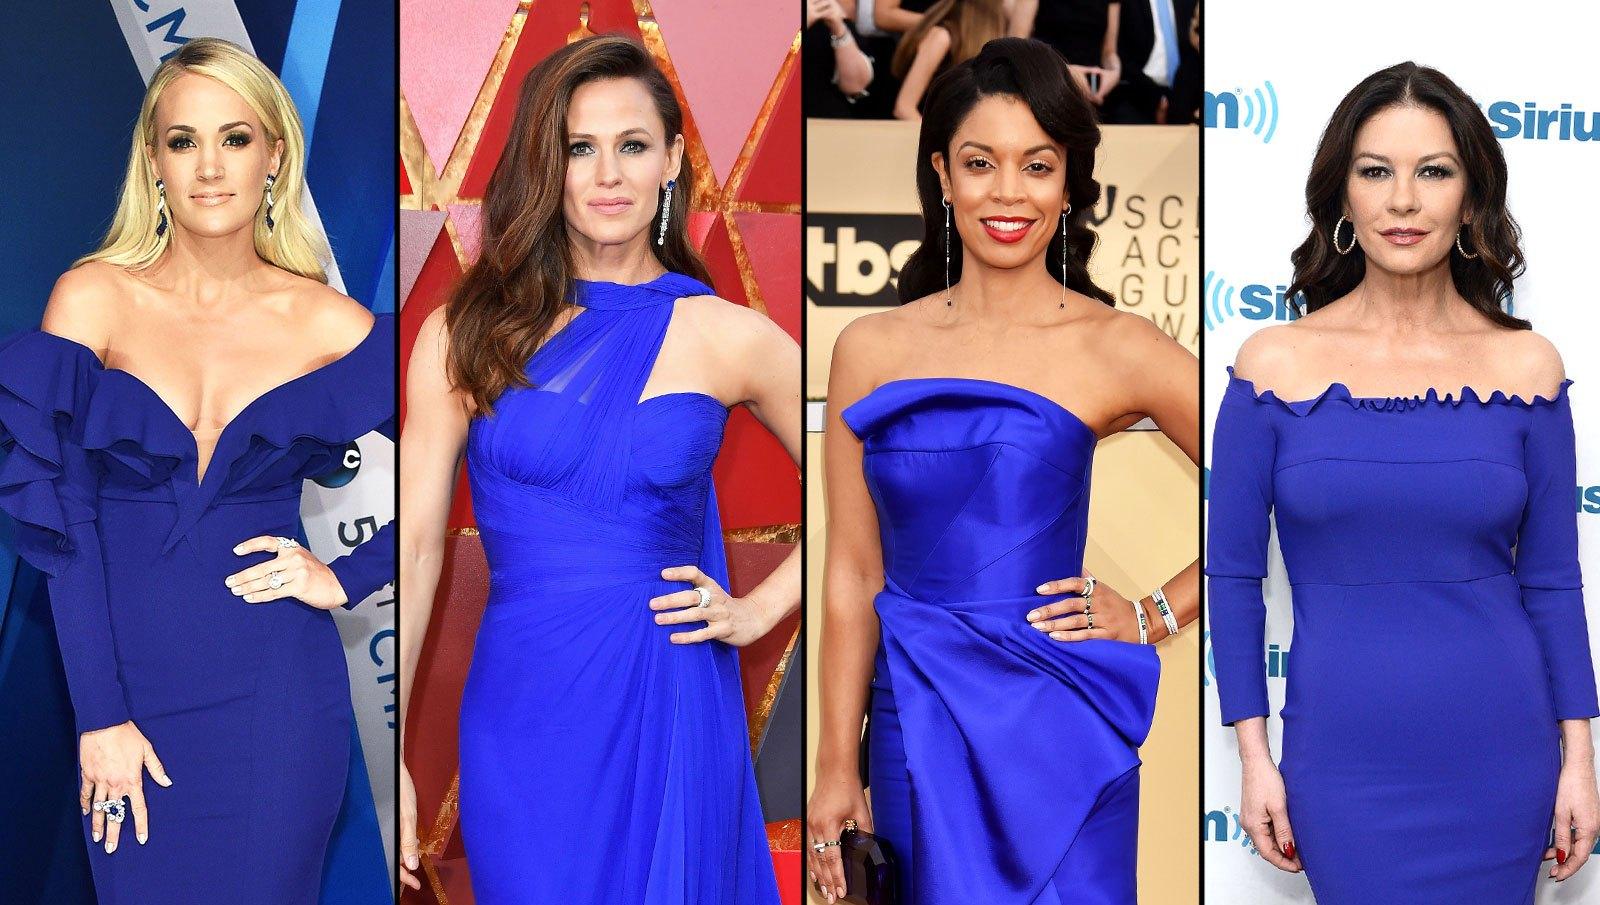 Carrie Underwood, Jennifer Garner, Susan Kelechi Watson, Catherine Zeta Jones